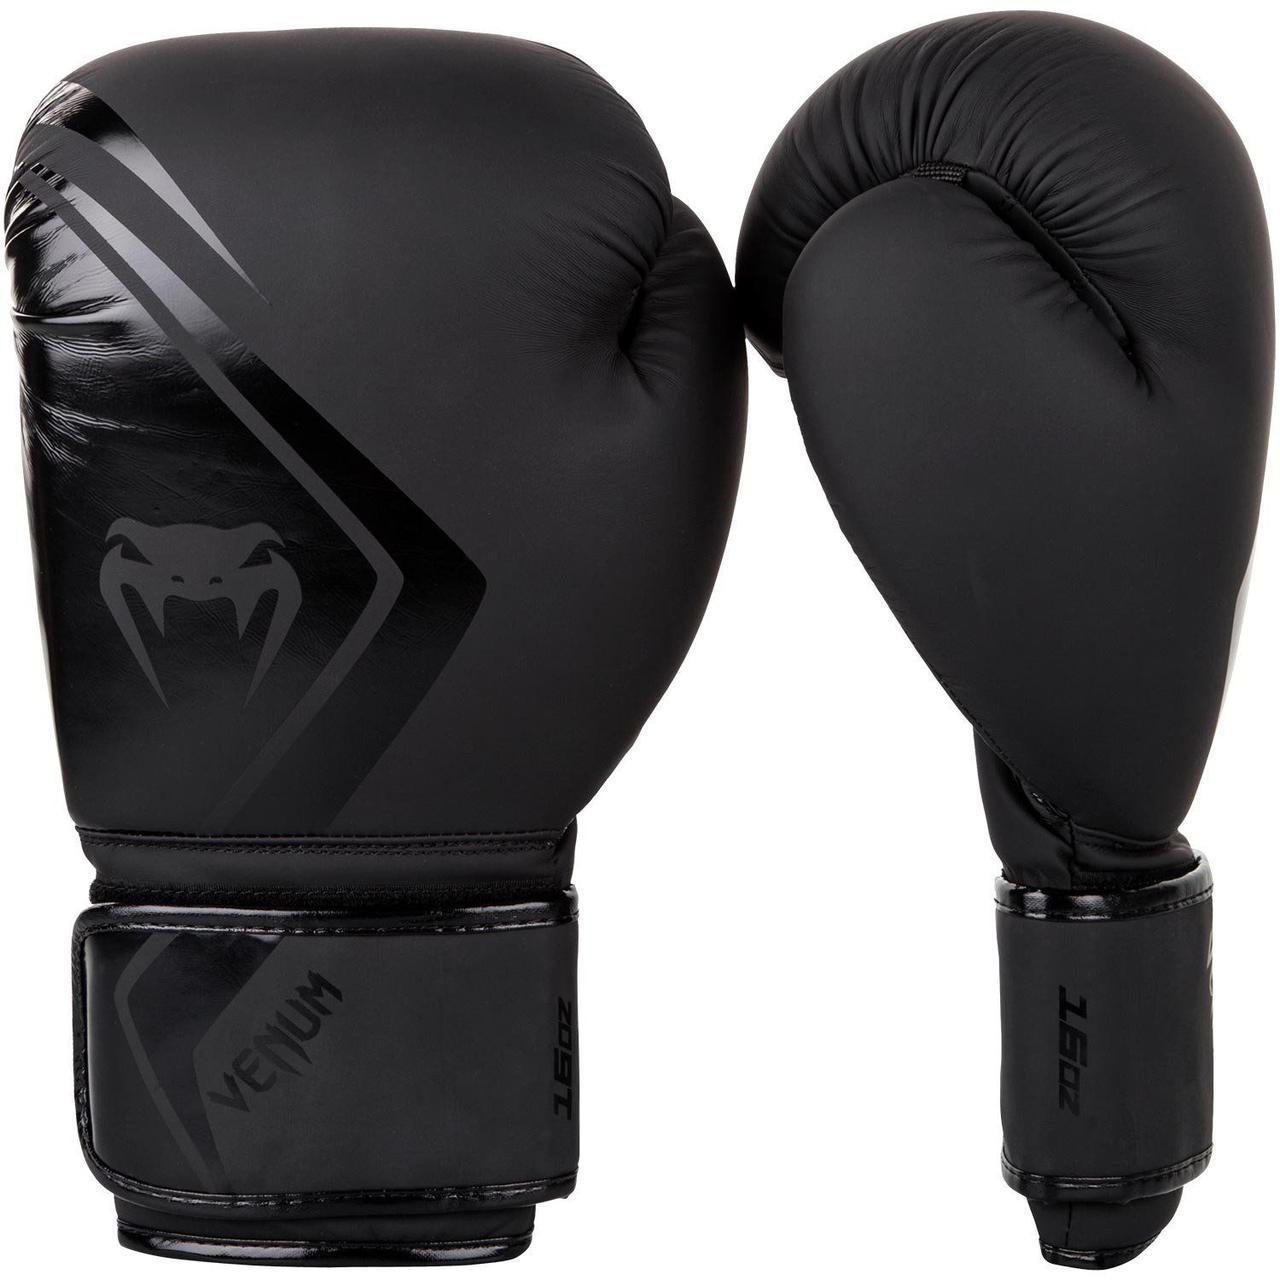 Боксерские перчатки Venum Contender 2/0 Neo Black